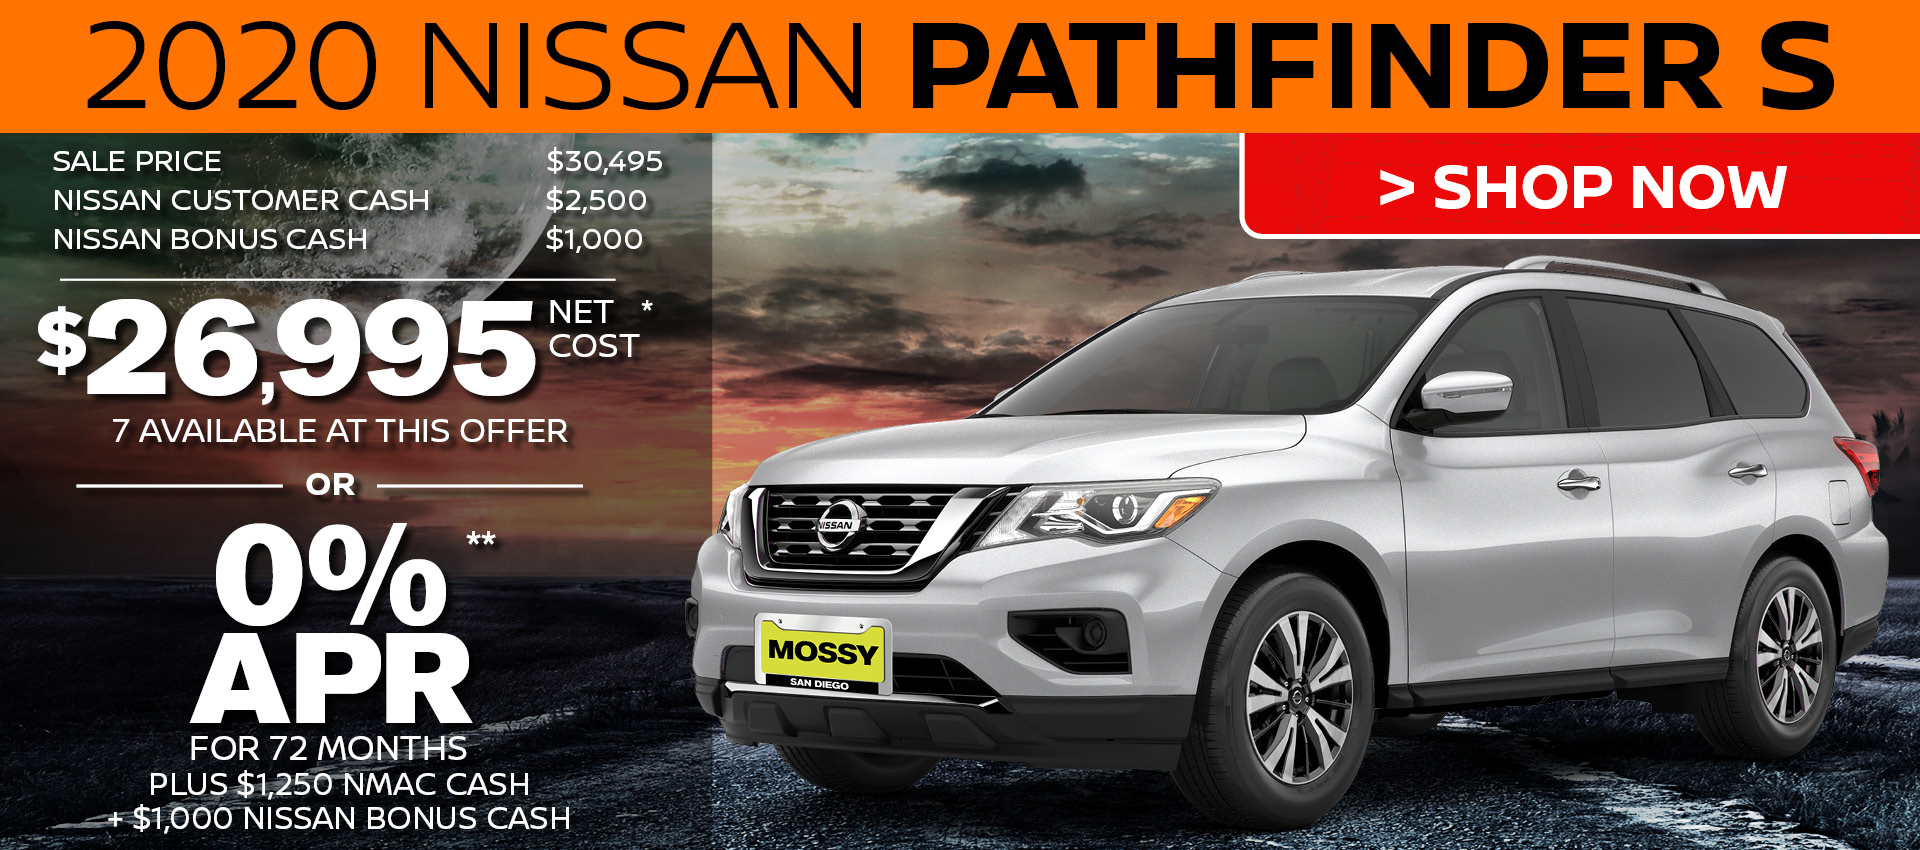 Mossy Nissan - Pathfinder HP